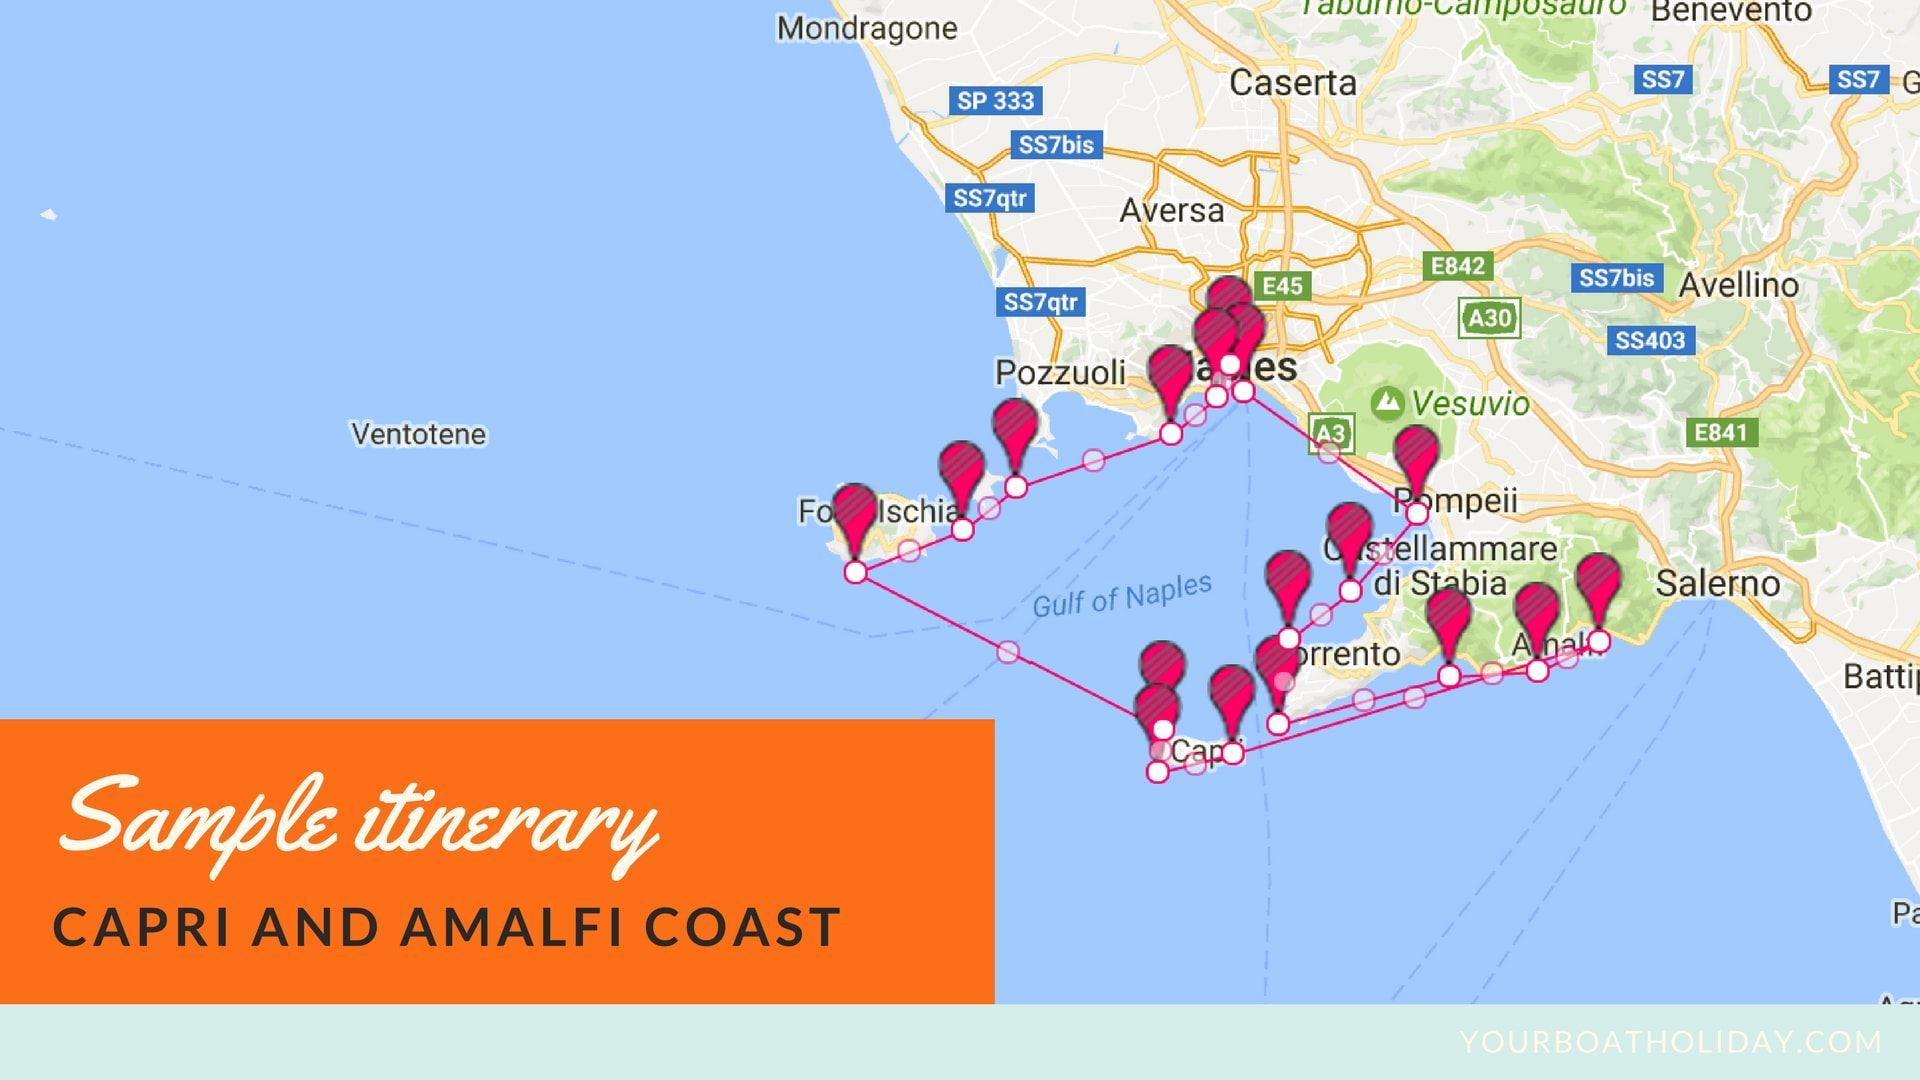 day-yacht-charter-in-capri-and-amalfi-coast